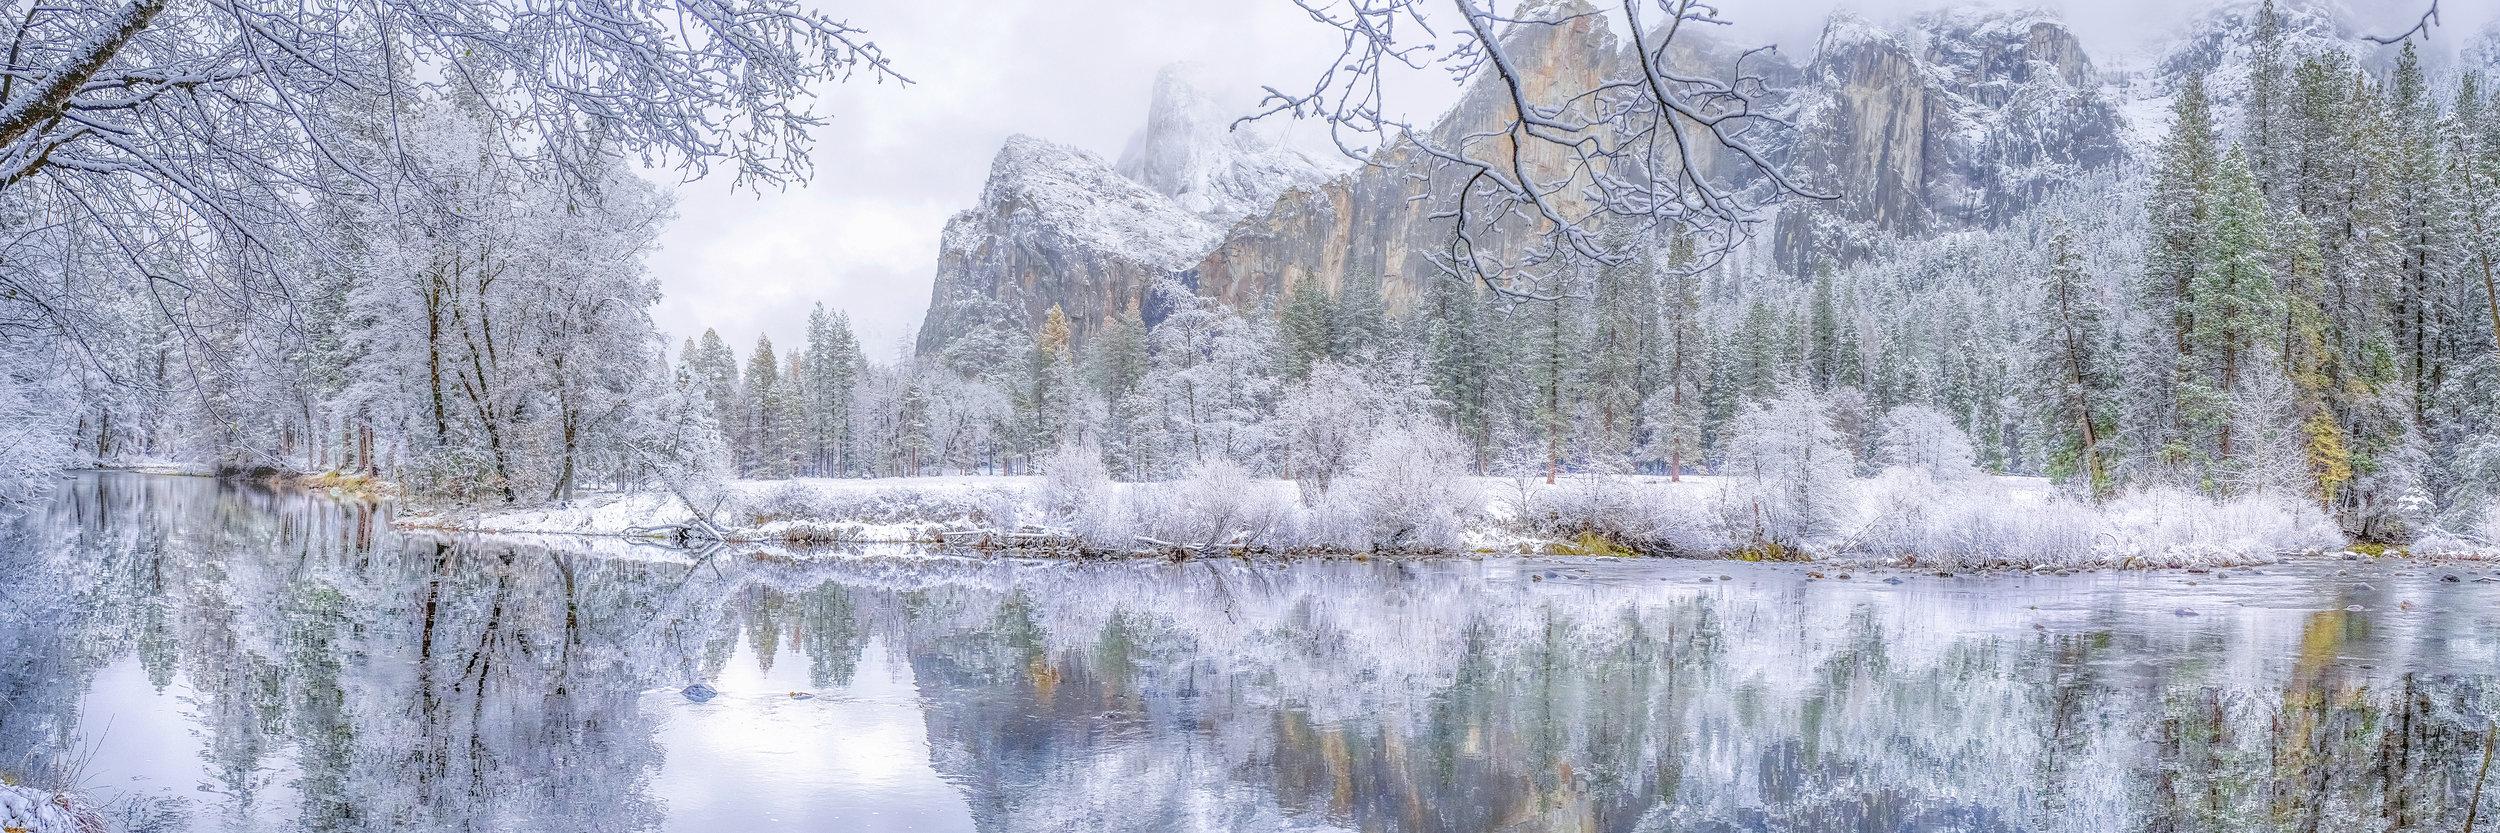 YosemiteSnow2.jpg